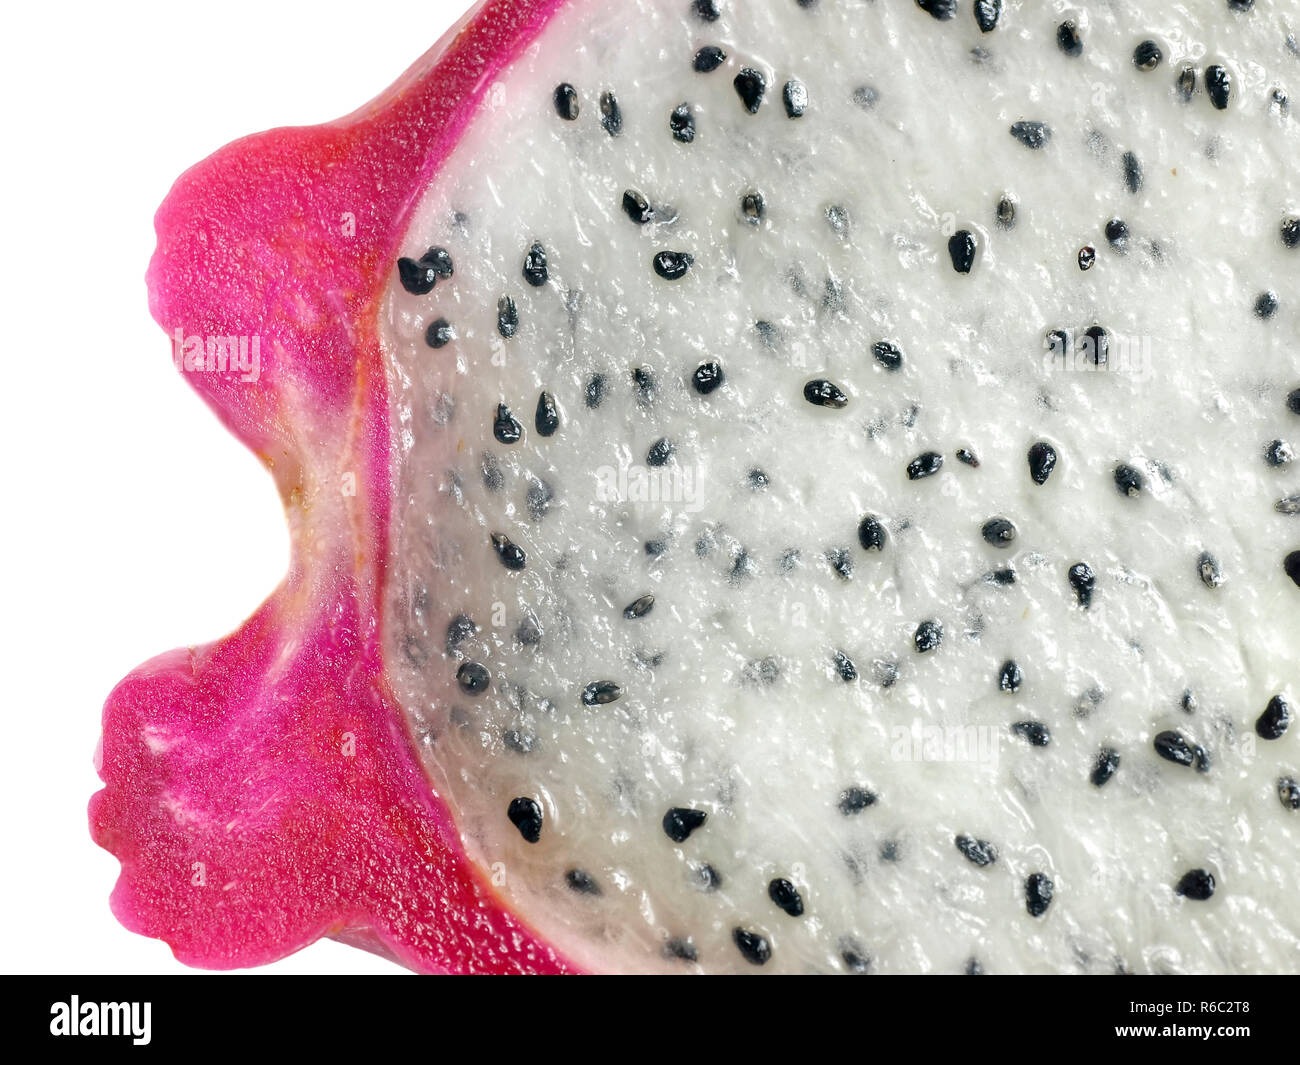 Pitahaya Drachenfrucht Anschnitt - Stock Image